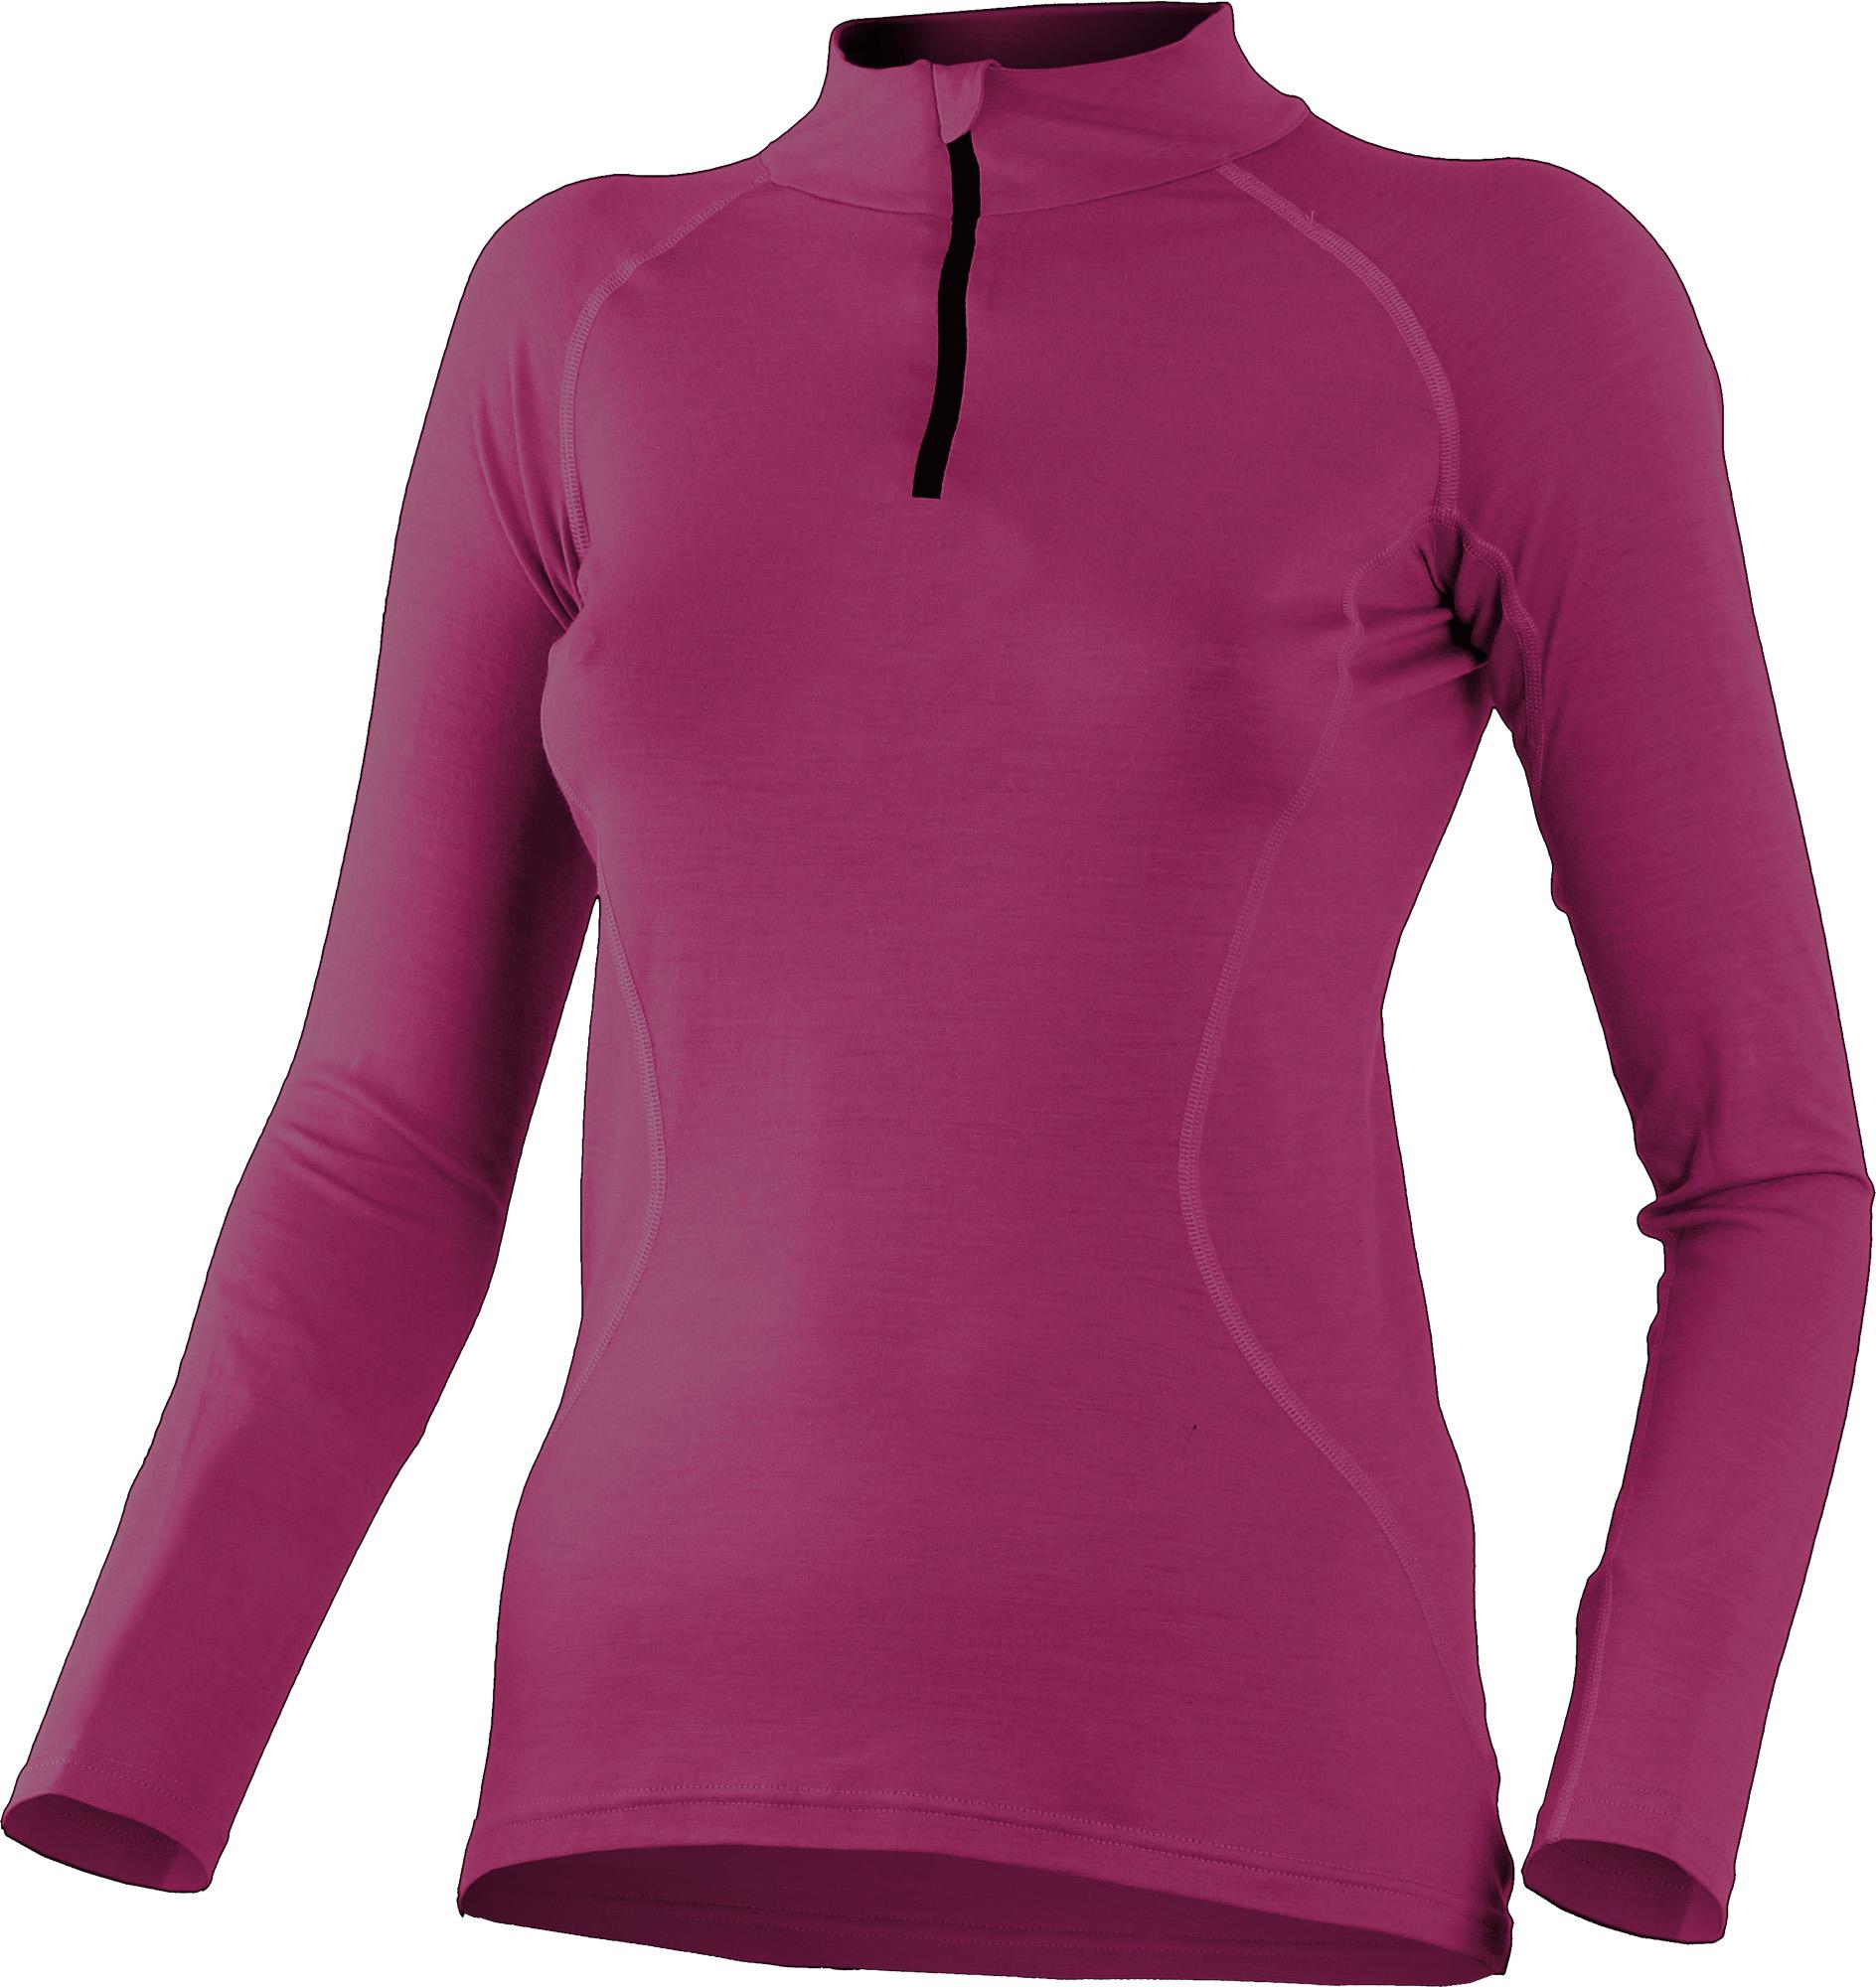 Lasting LISA 4848 růžová Merino triko dámské Velikost: XS